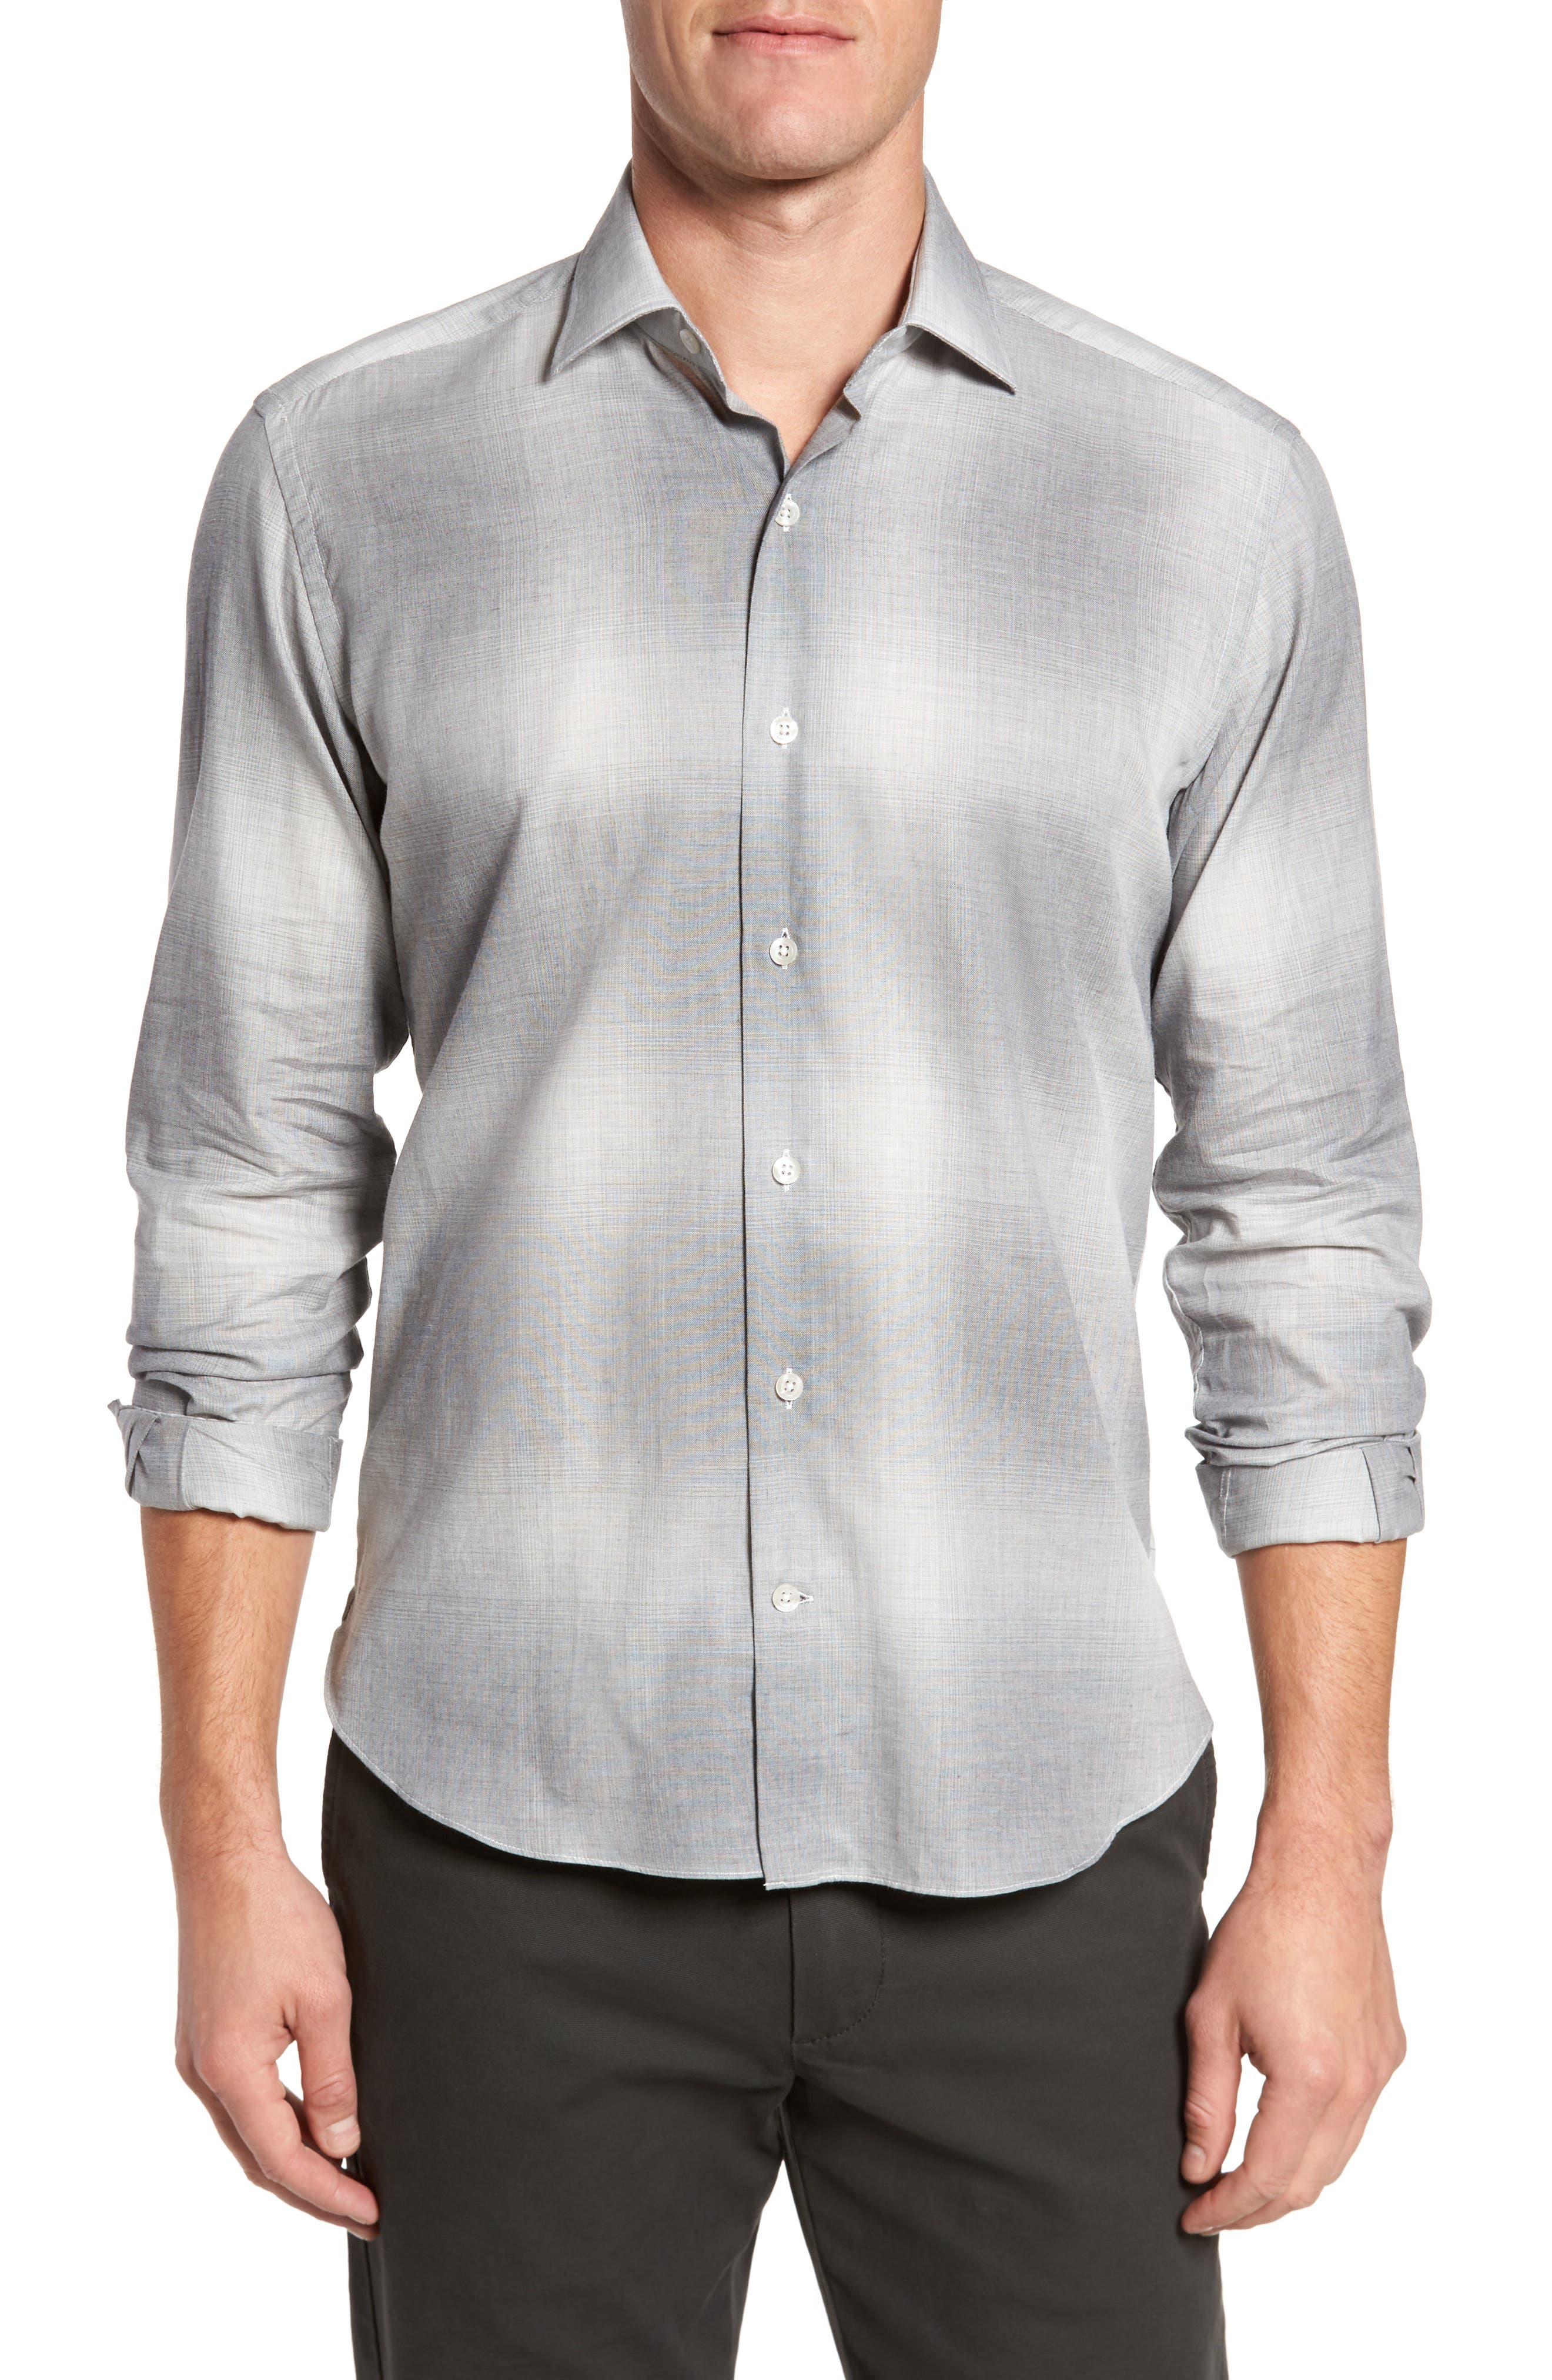 Alternate Image 1 Selected - Culturata Slim Fit Plaid Sport Shirt